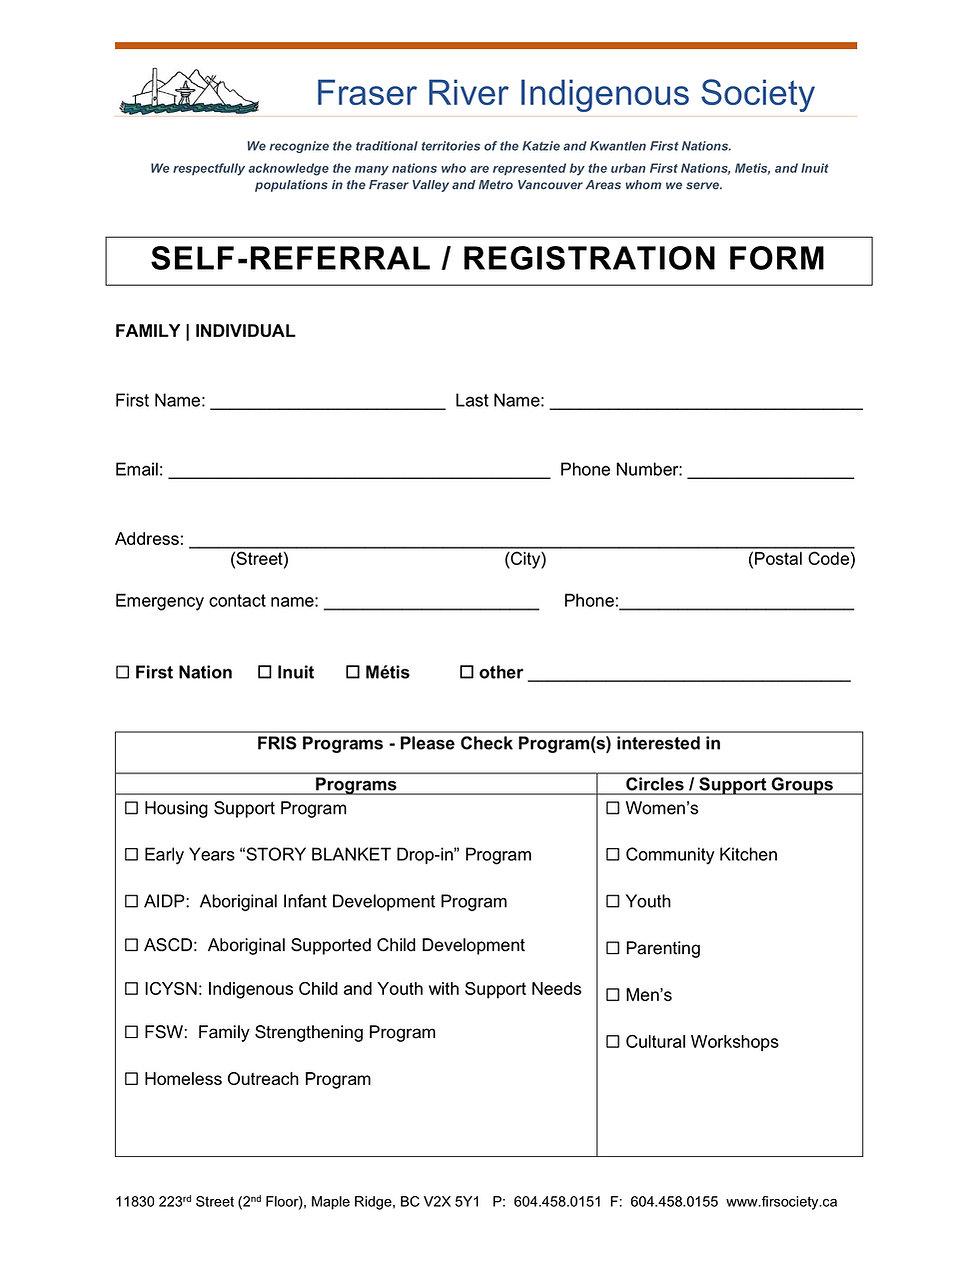 FRIS Self Refferal - Registration Form.j